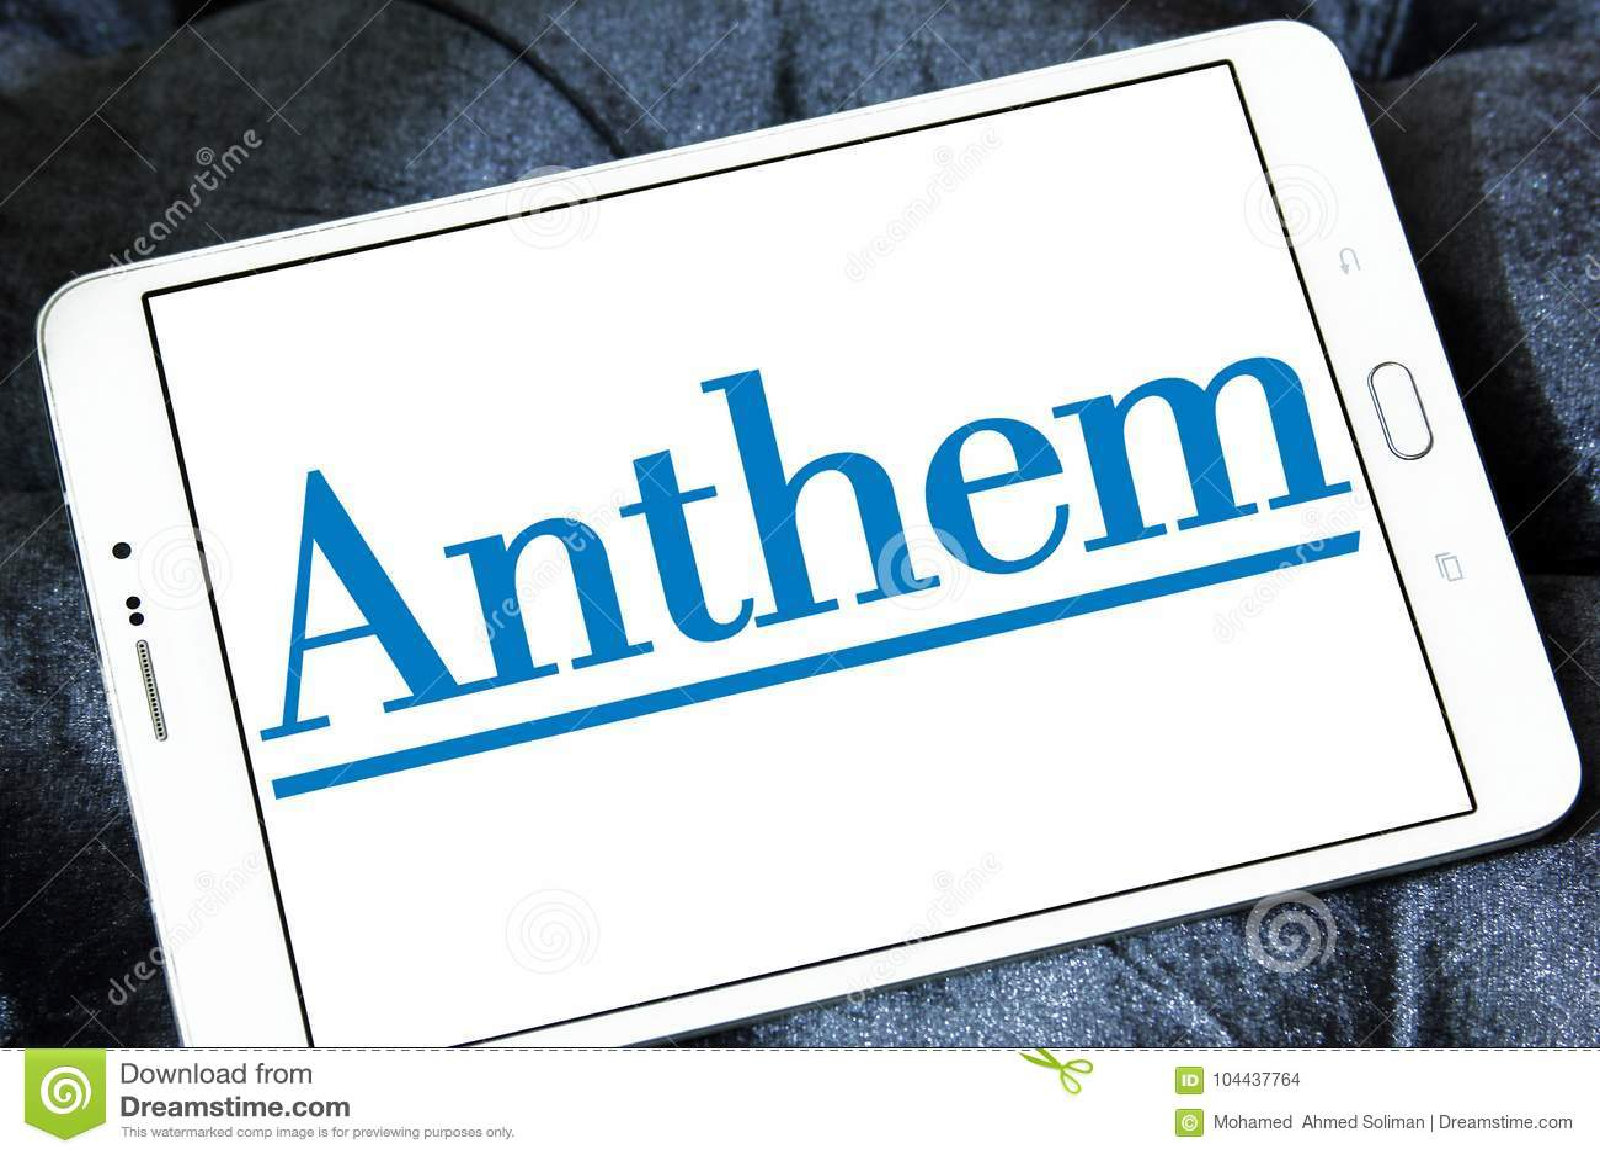 Anthem Health Insurance Company Logo Editorial Stock Image ...